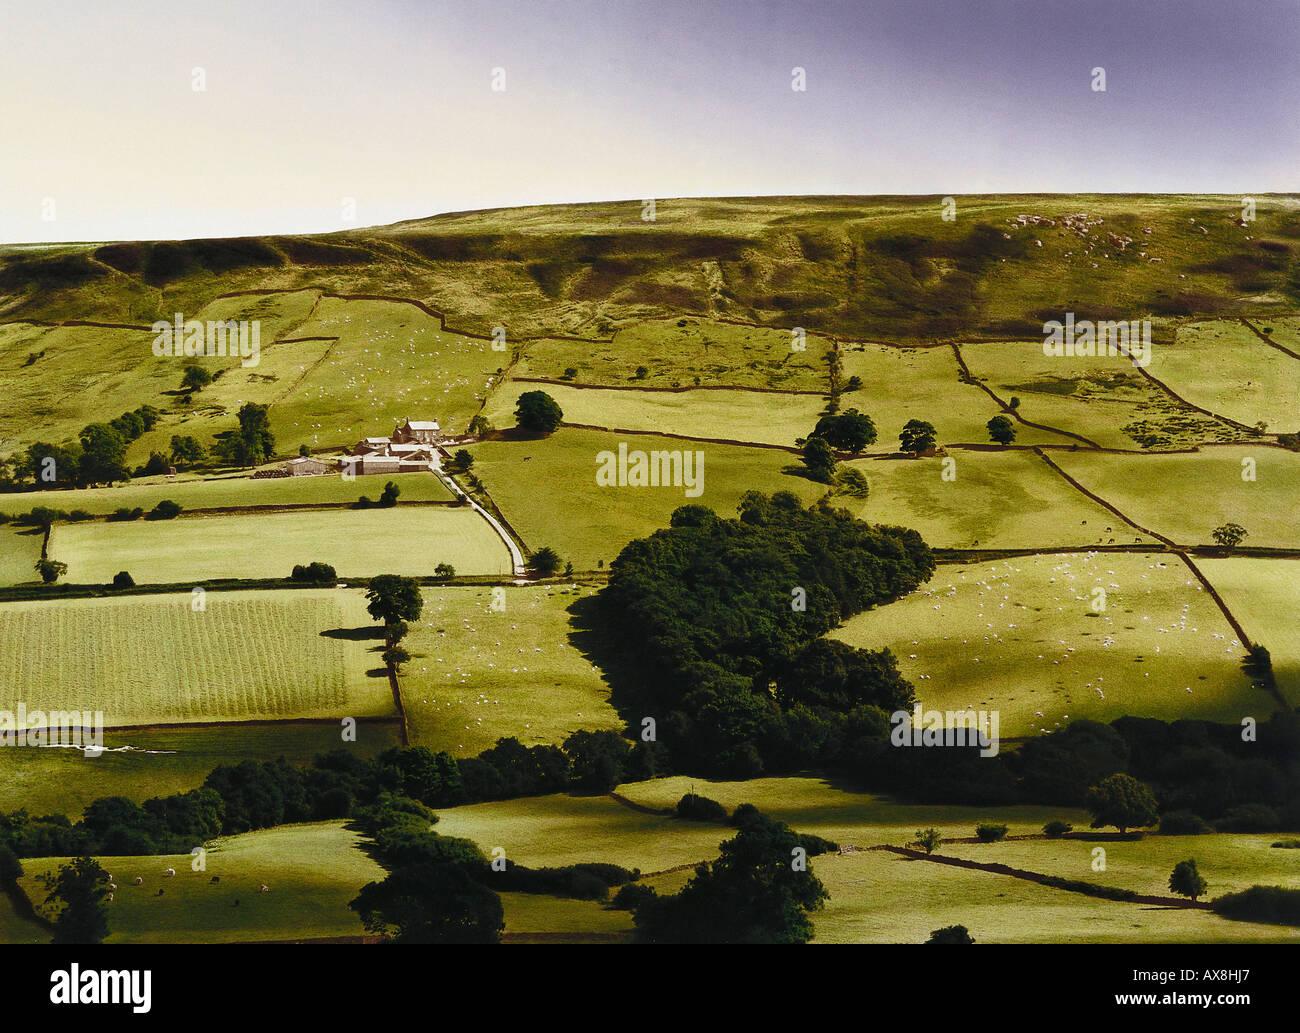 E. George, Gott schuetze dieses Haus, Farmland, Yorkshire Dales Yorkshire, Great Britain Stock Photo